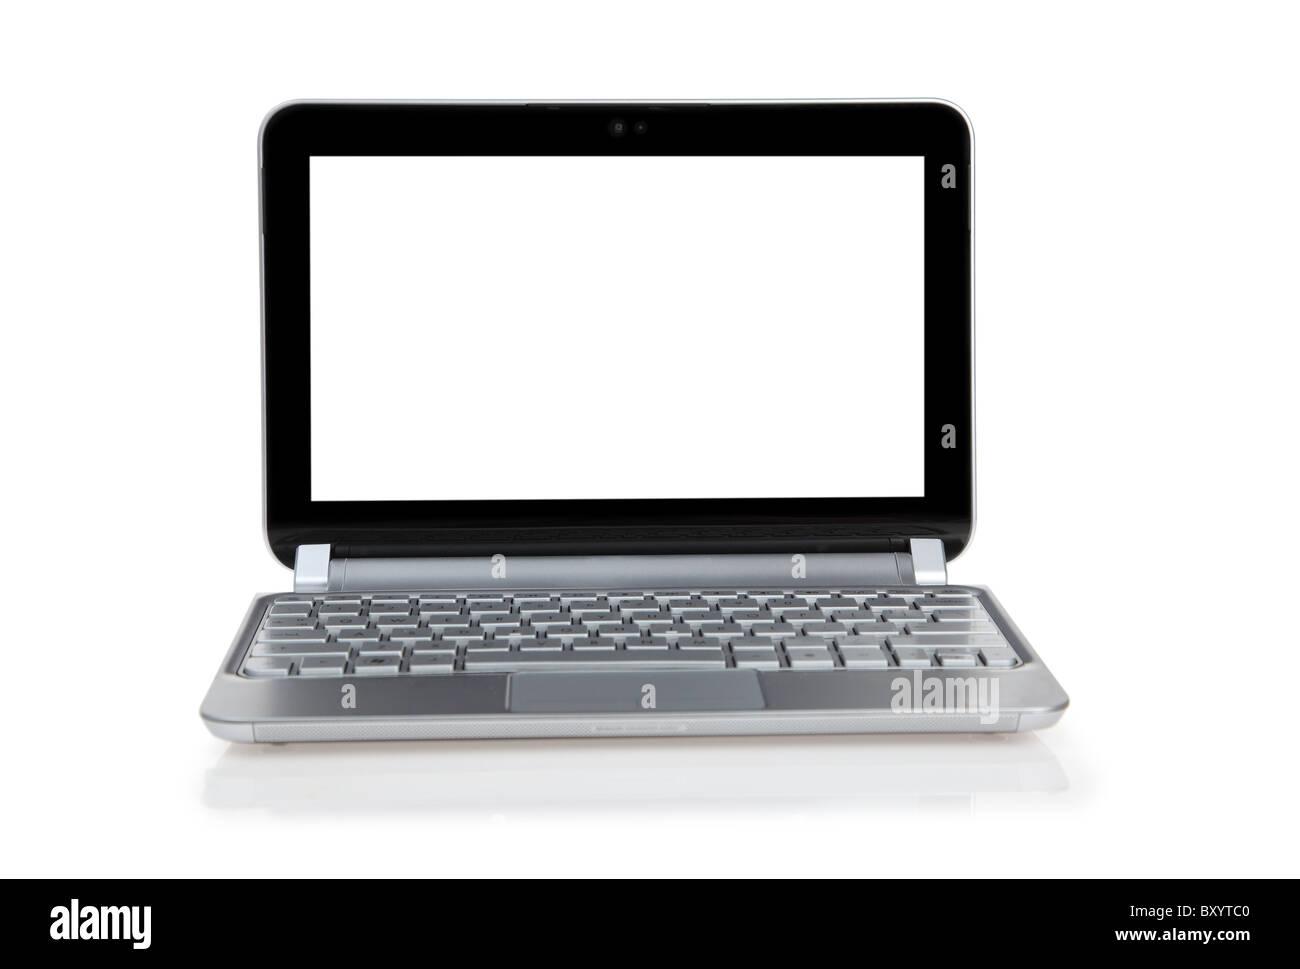 Ordenador portátil sobre fondo blanco. Imagen De Stock